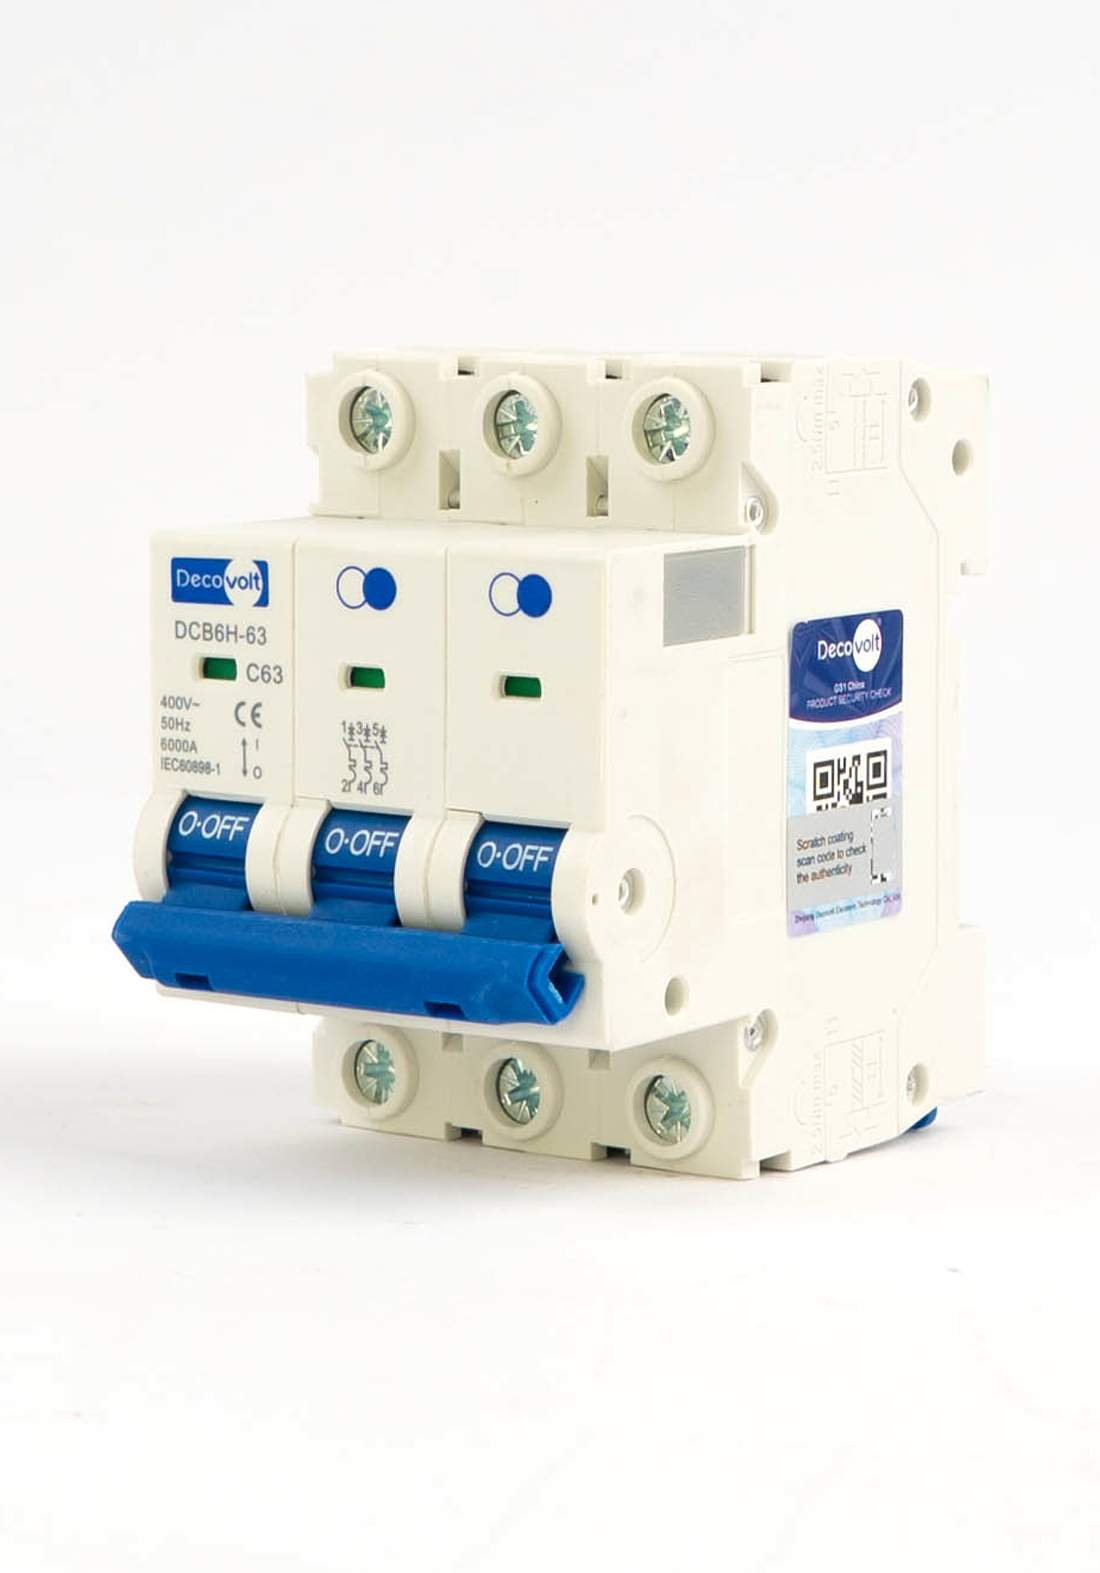 DecoVolt 2501 Triple drill 63 ampere جوزة ثلاثية 63 امبير